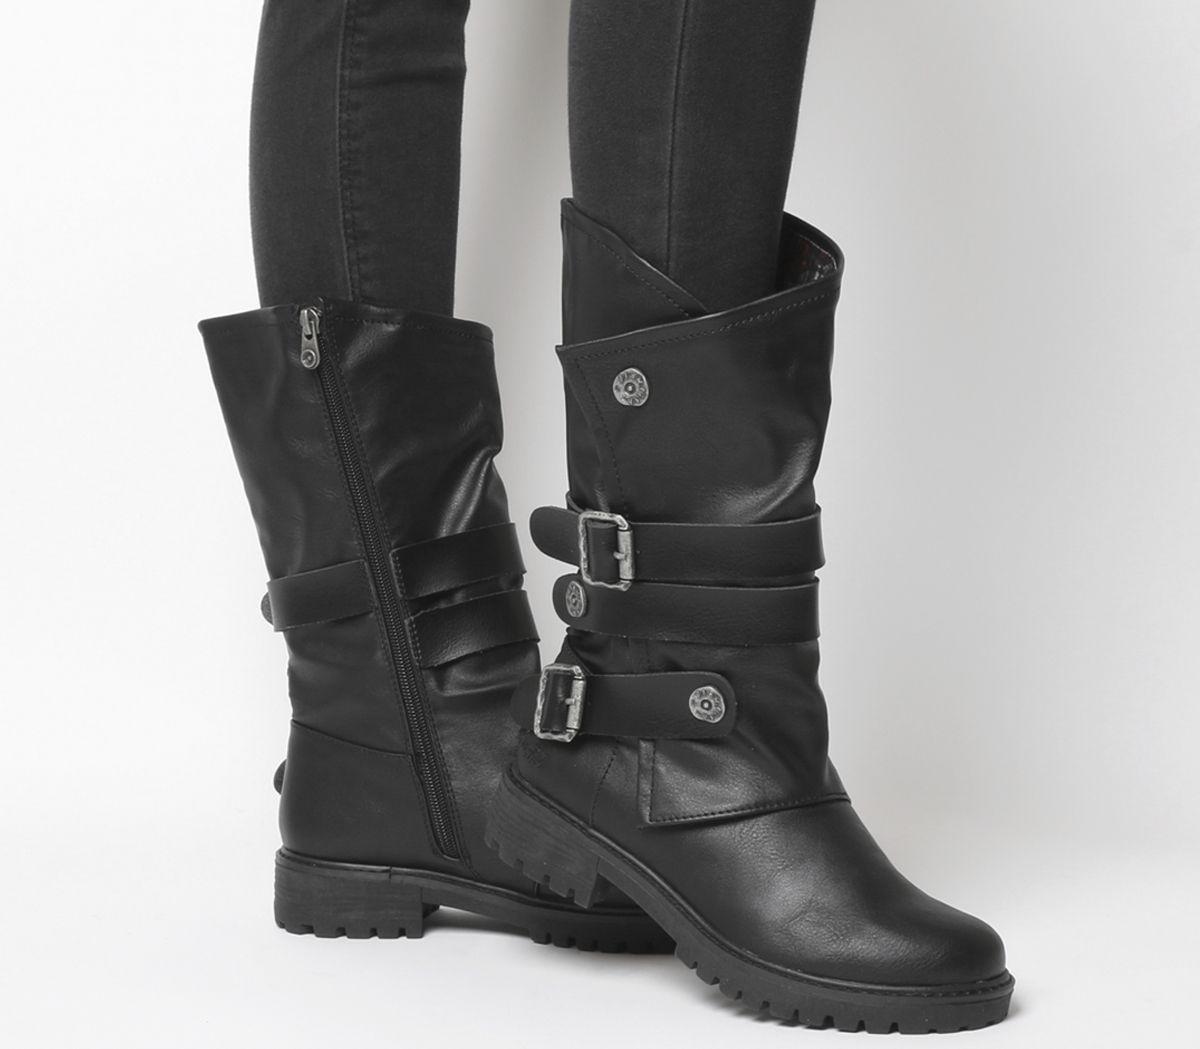 13732eeffa3 Blowfish Rider Tall Boots Black Alamo - Knee Boots